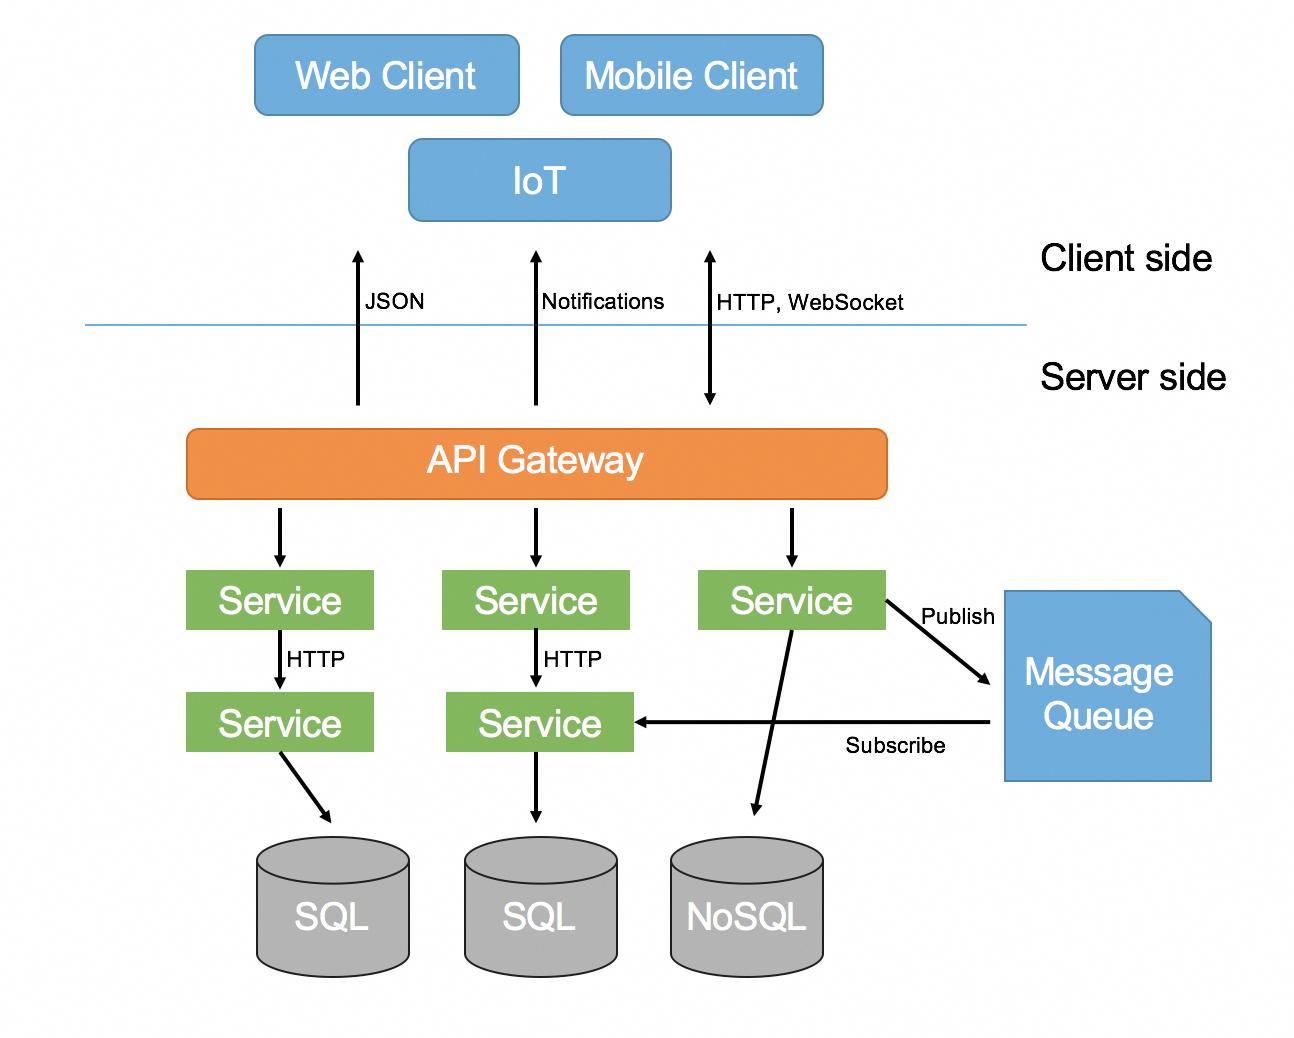 microservices architecture webdeveloper [ 1294 x 1038 Pixel ]